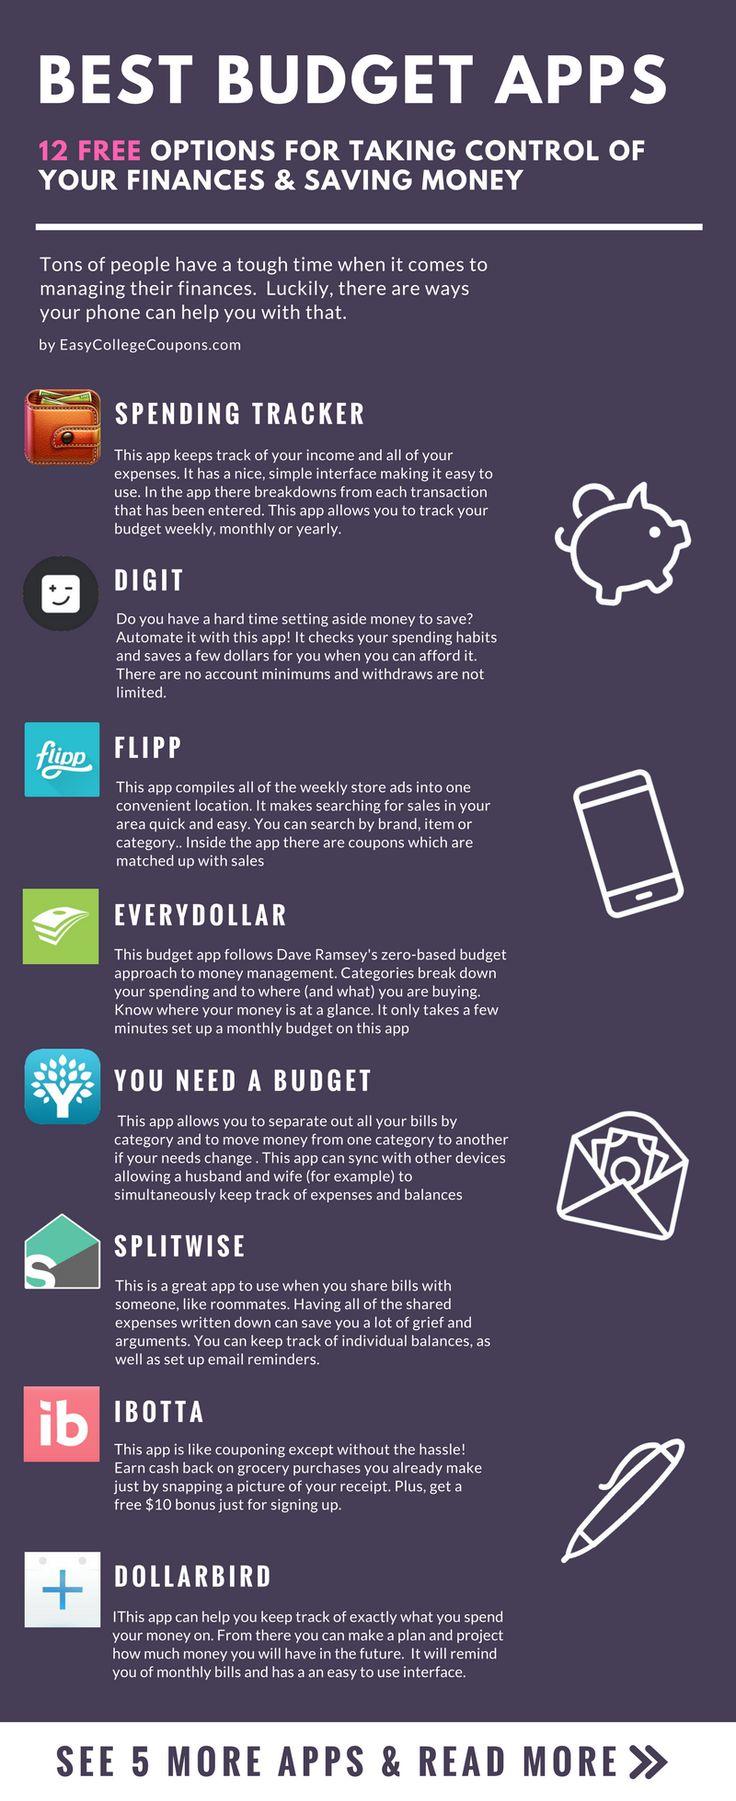 Best Budget Apps